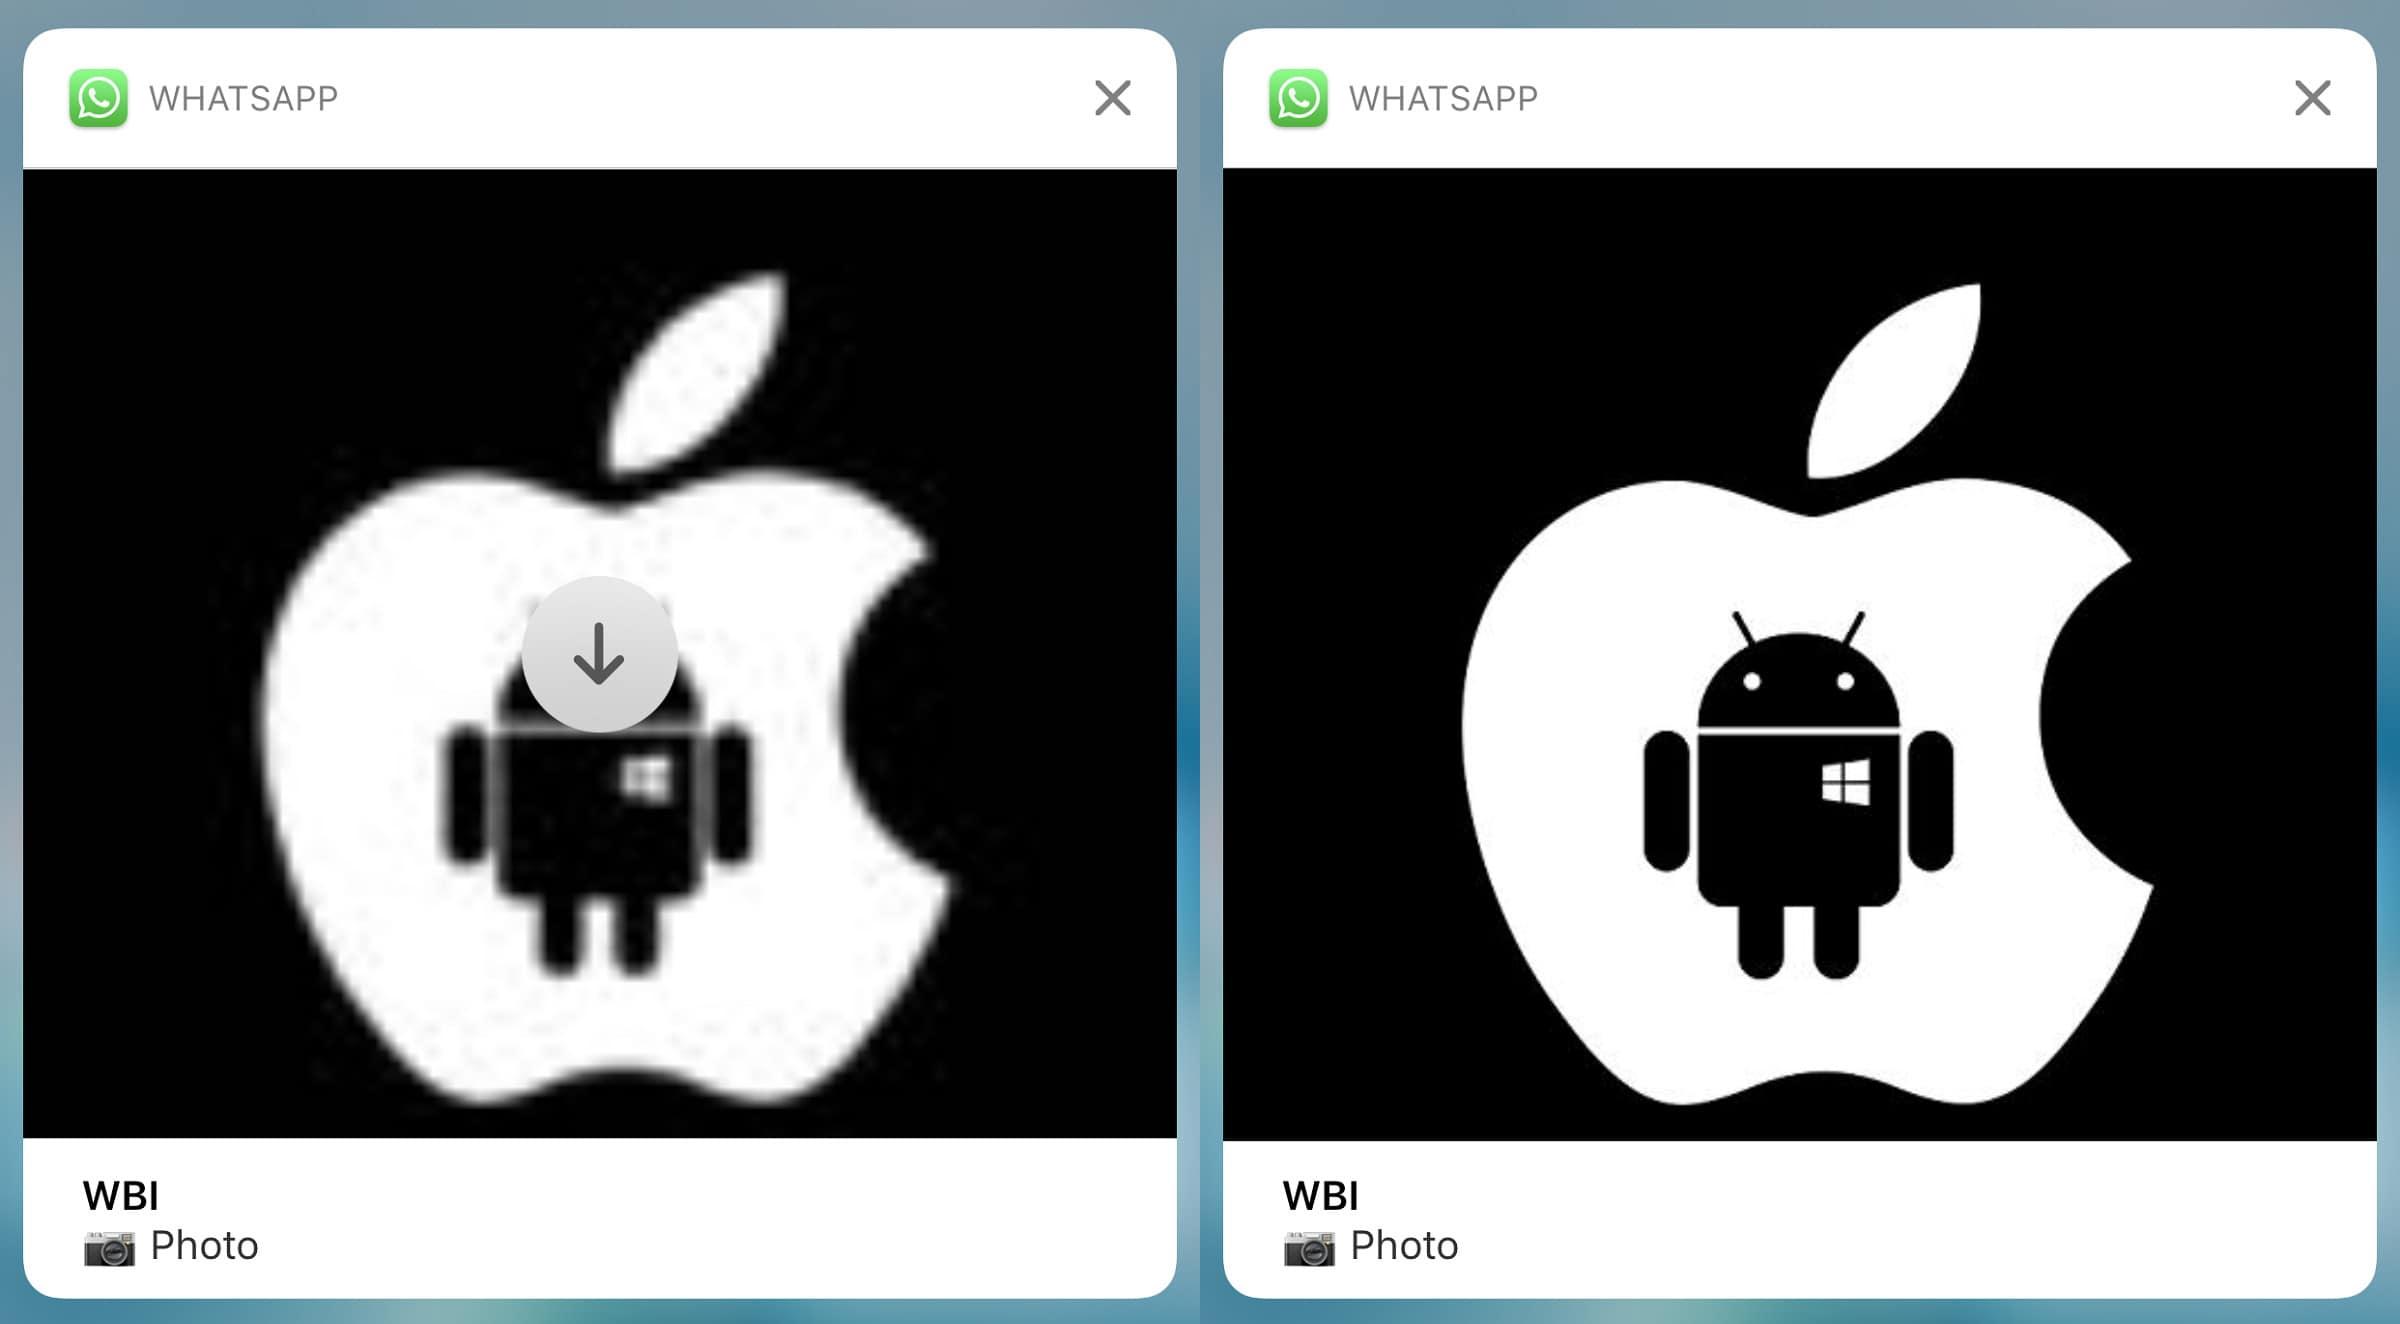 WhatsApp media previews on iOS